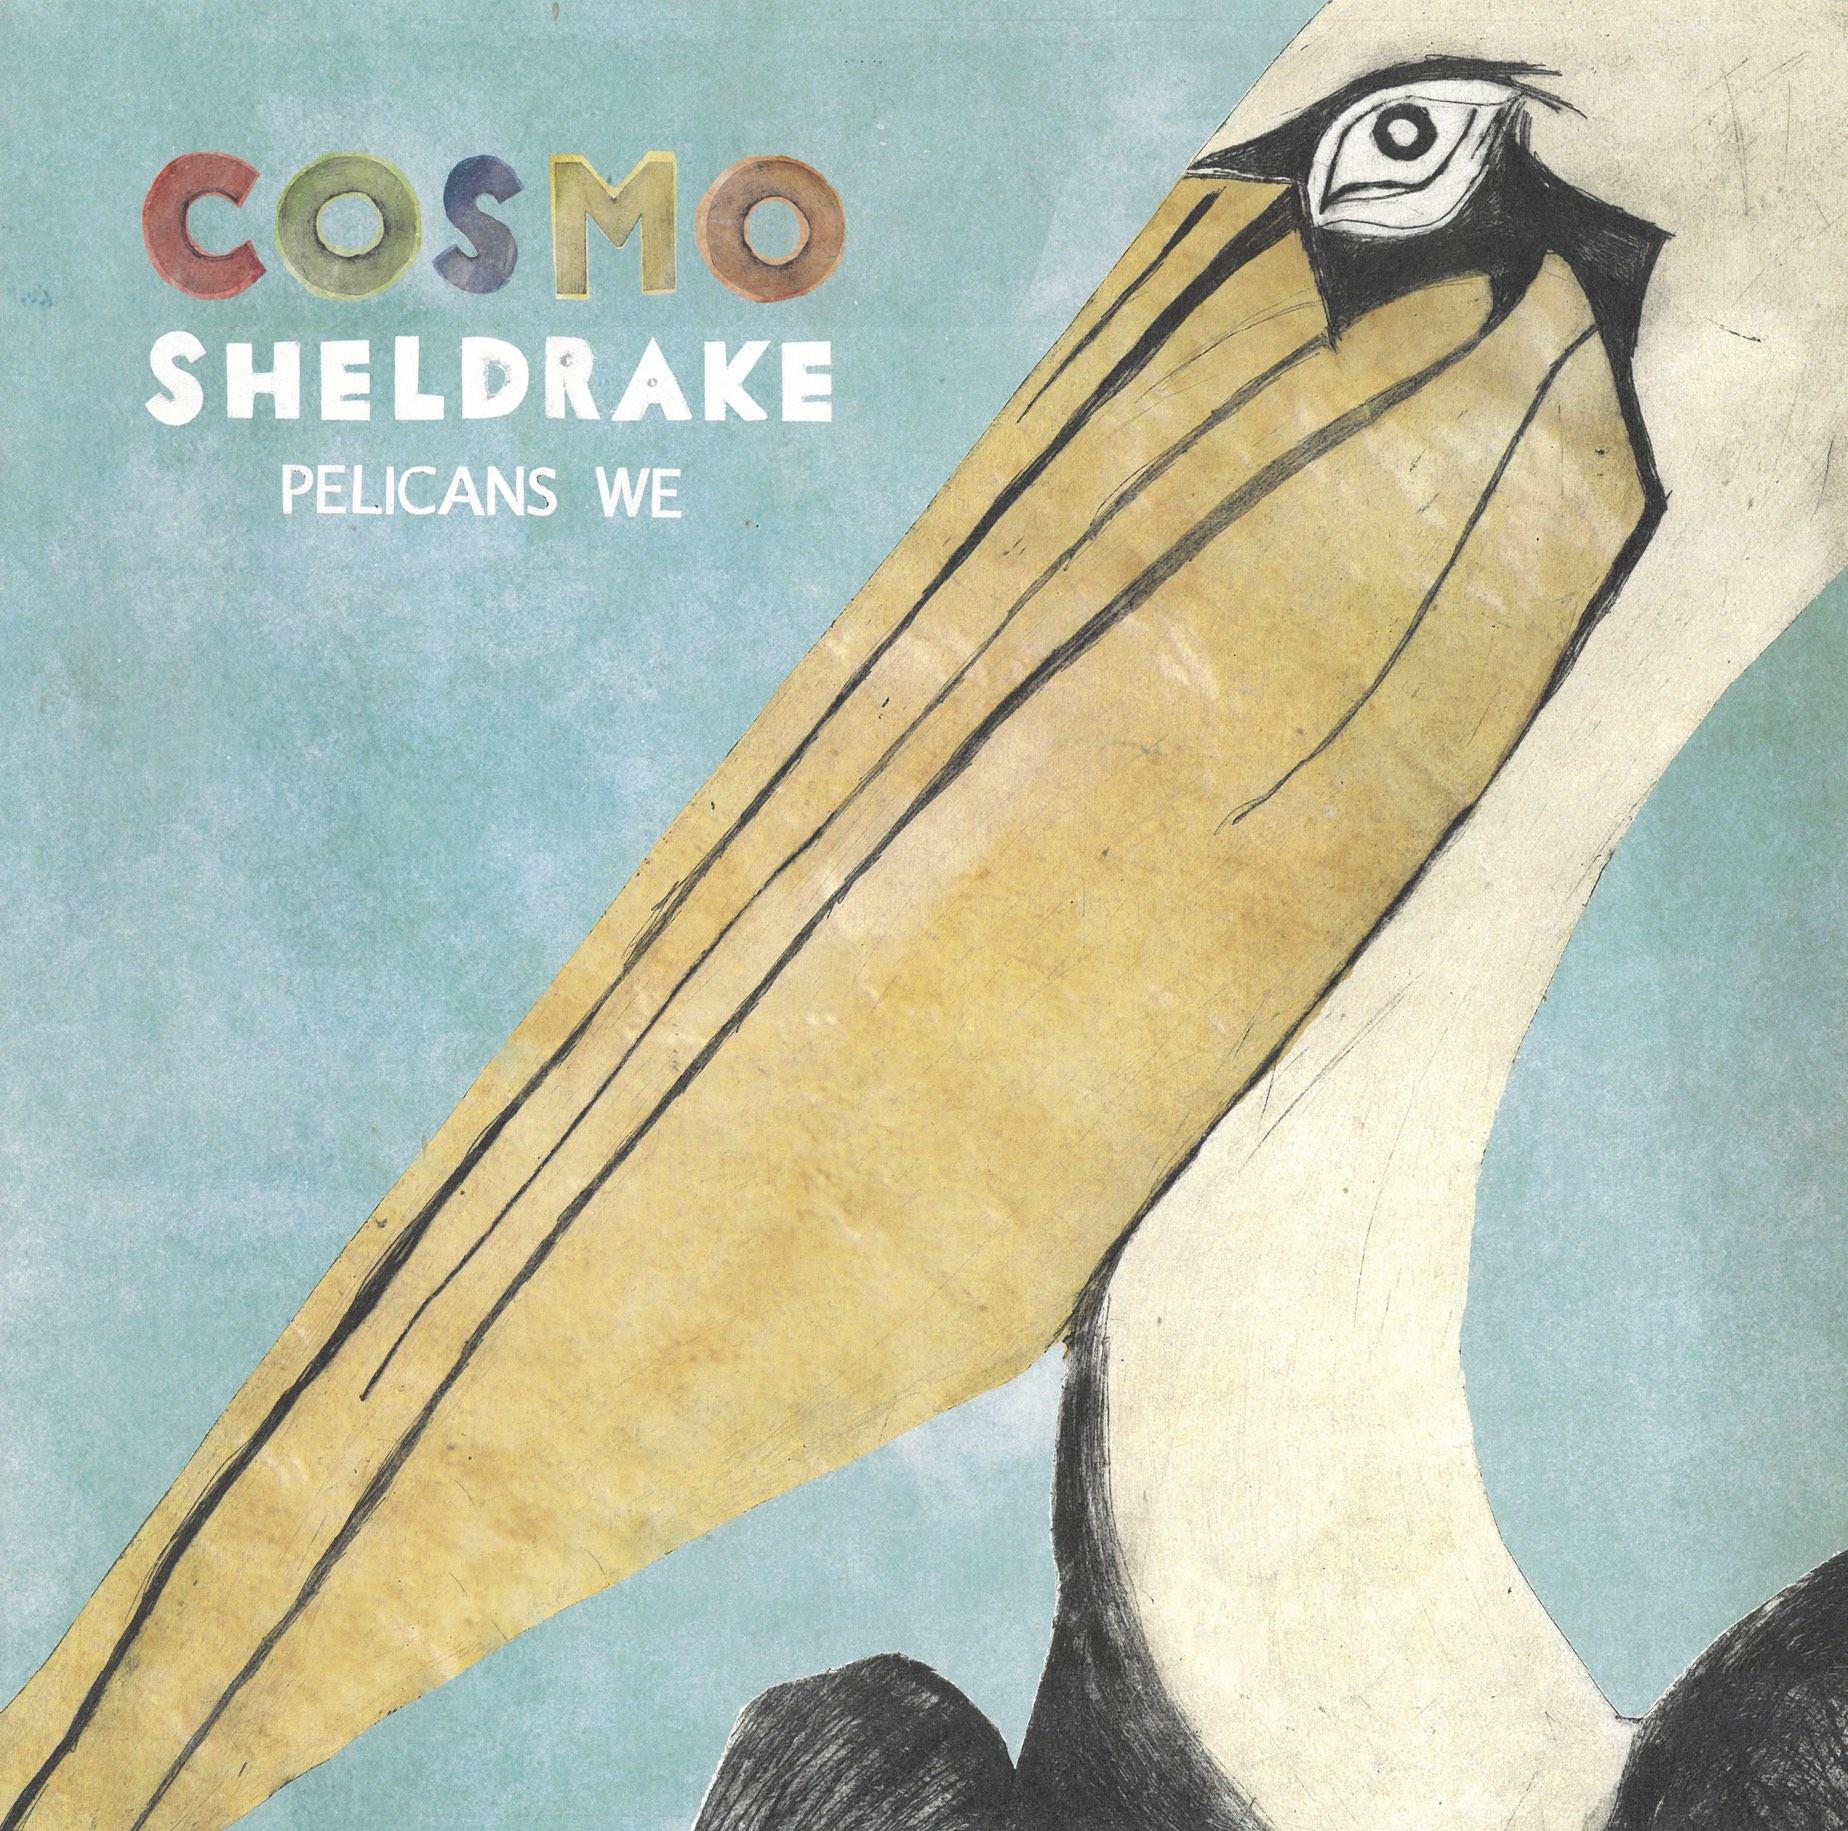 2014 - Cosmo Sheldrake